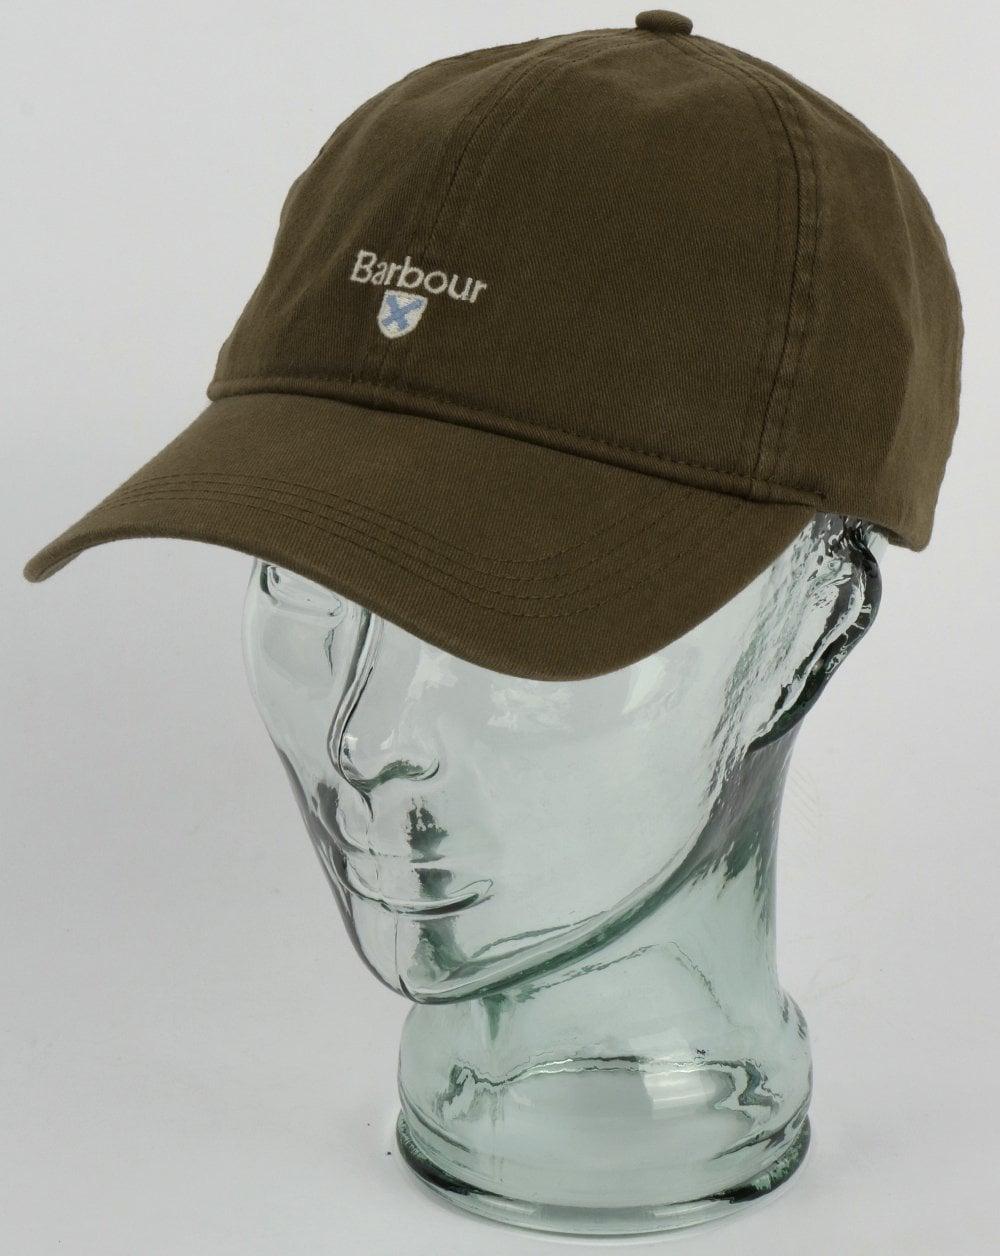 01496d74a329e Barbour Cascade Baseball Cap Olive,green,sports,logo,cotton